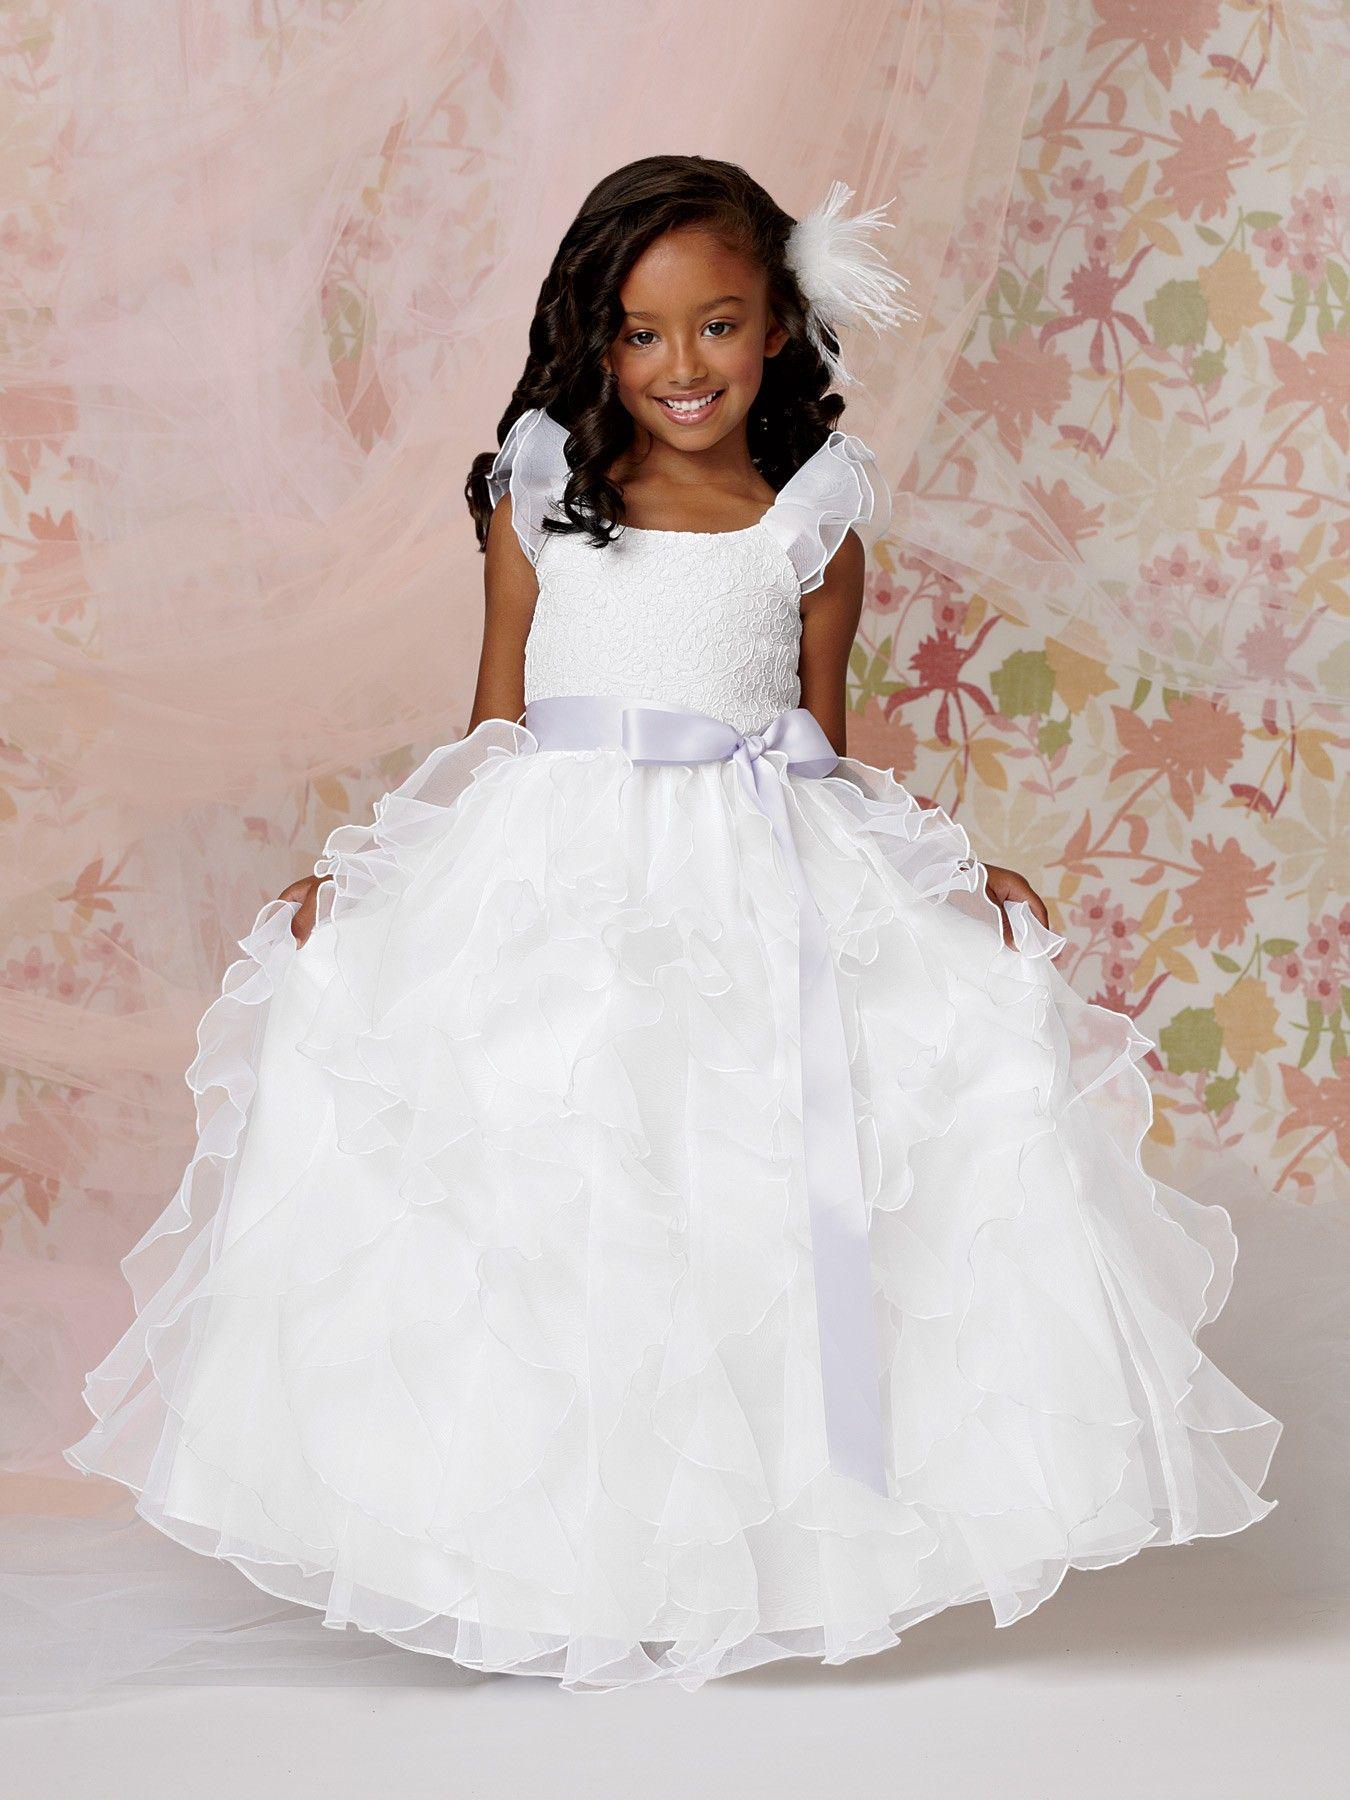 Puff sleeve ruffle skirt floor length lace bodice flower girl dress puff sleeve ruffle skirt floor length lace bodice flower girl dress with ribbon sash mightylinksfo